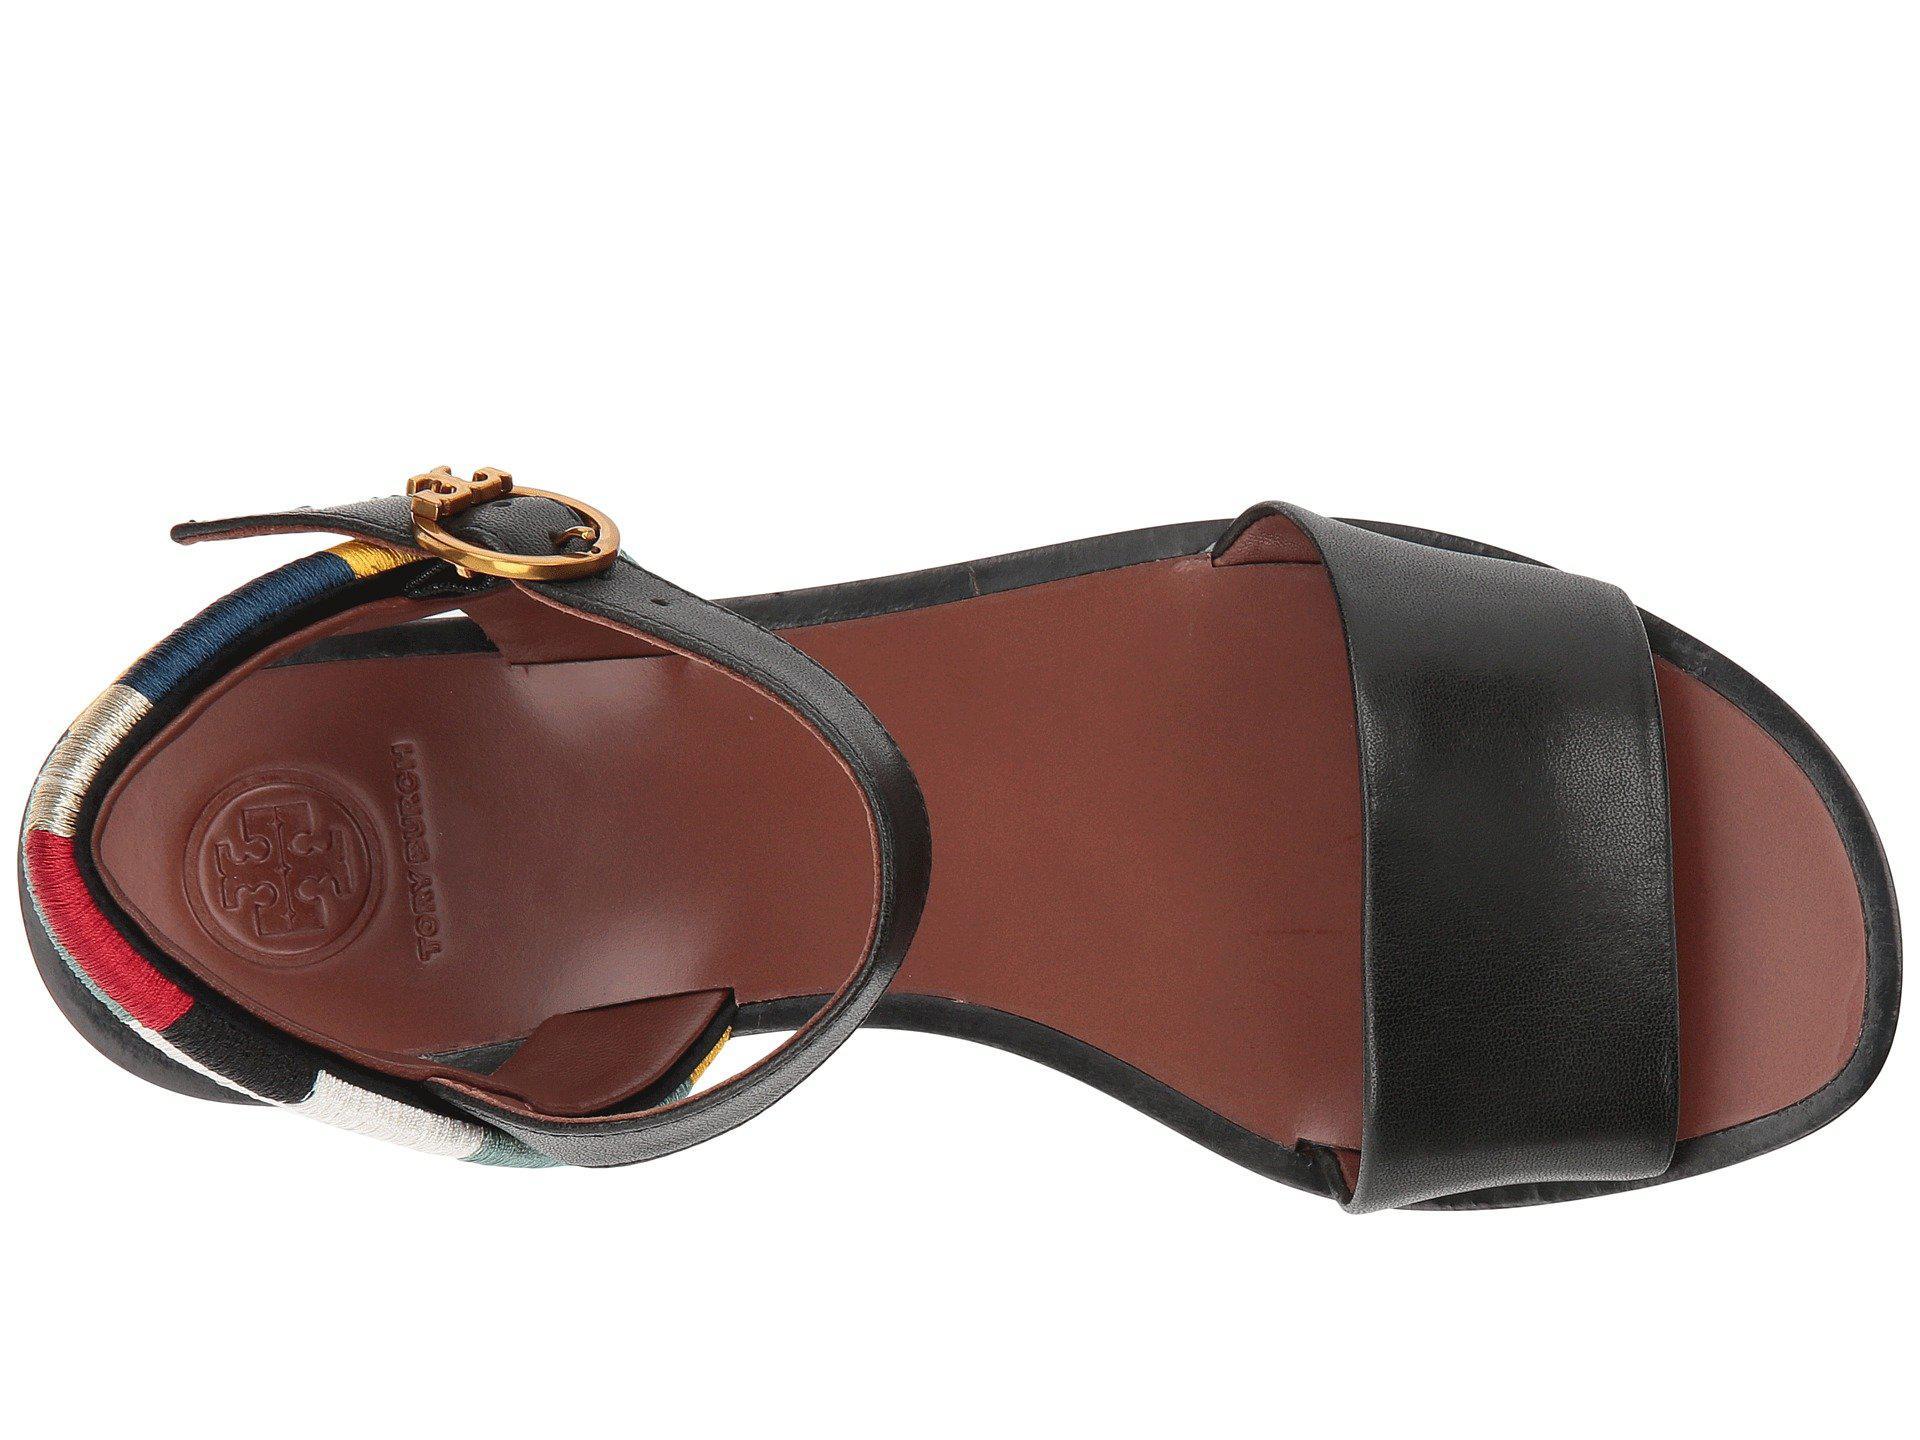 1e7f24965e5c Lyst - Tory Burch Camilla 40mm Platform Sandal in Black